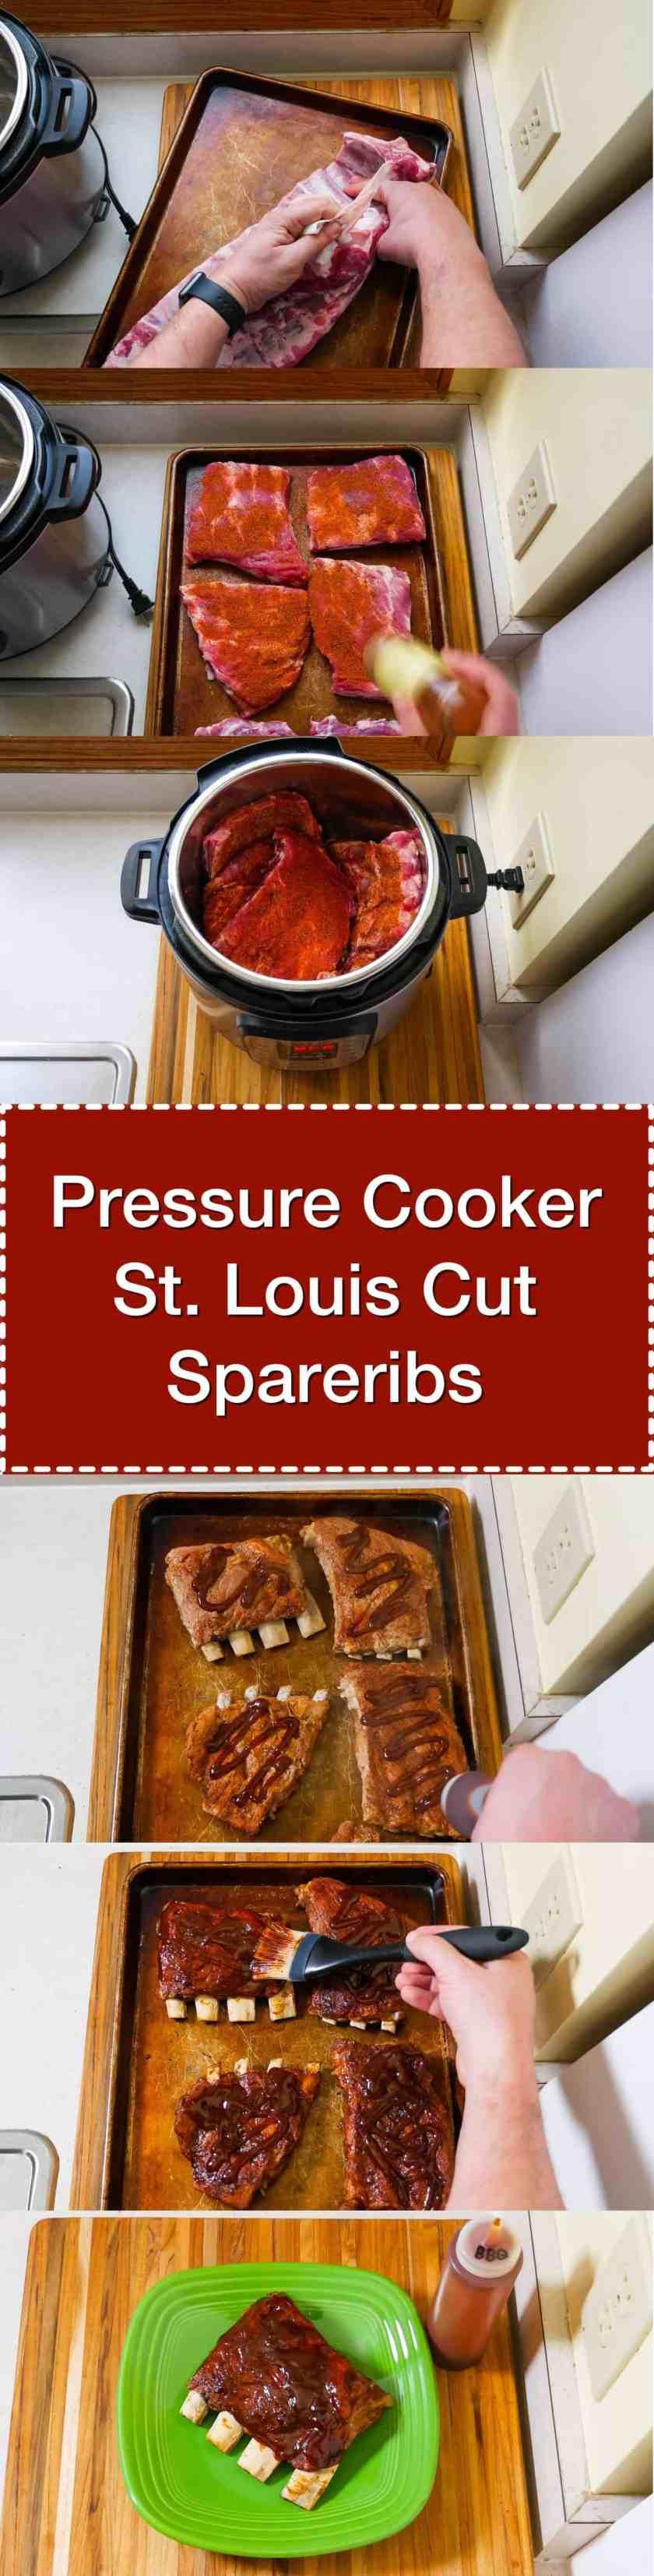 Pressure Cooker St Louis Cut Spareribs | DadCooksDinner.com